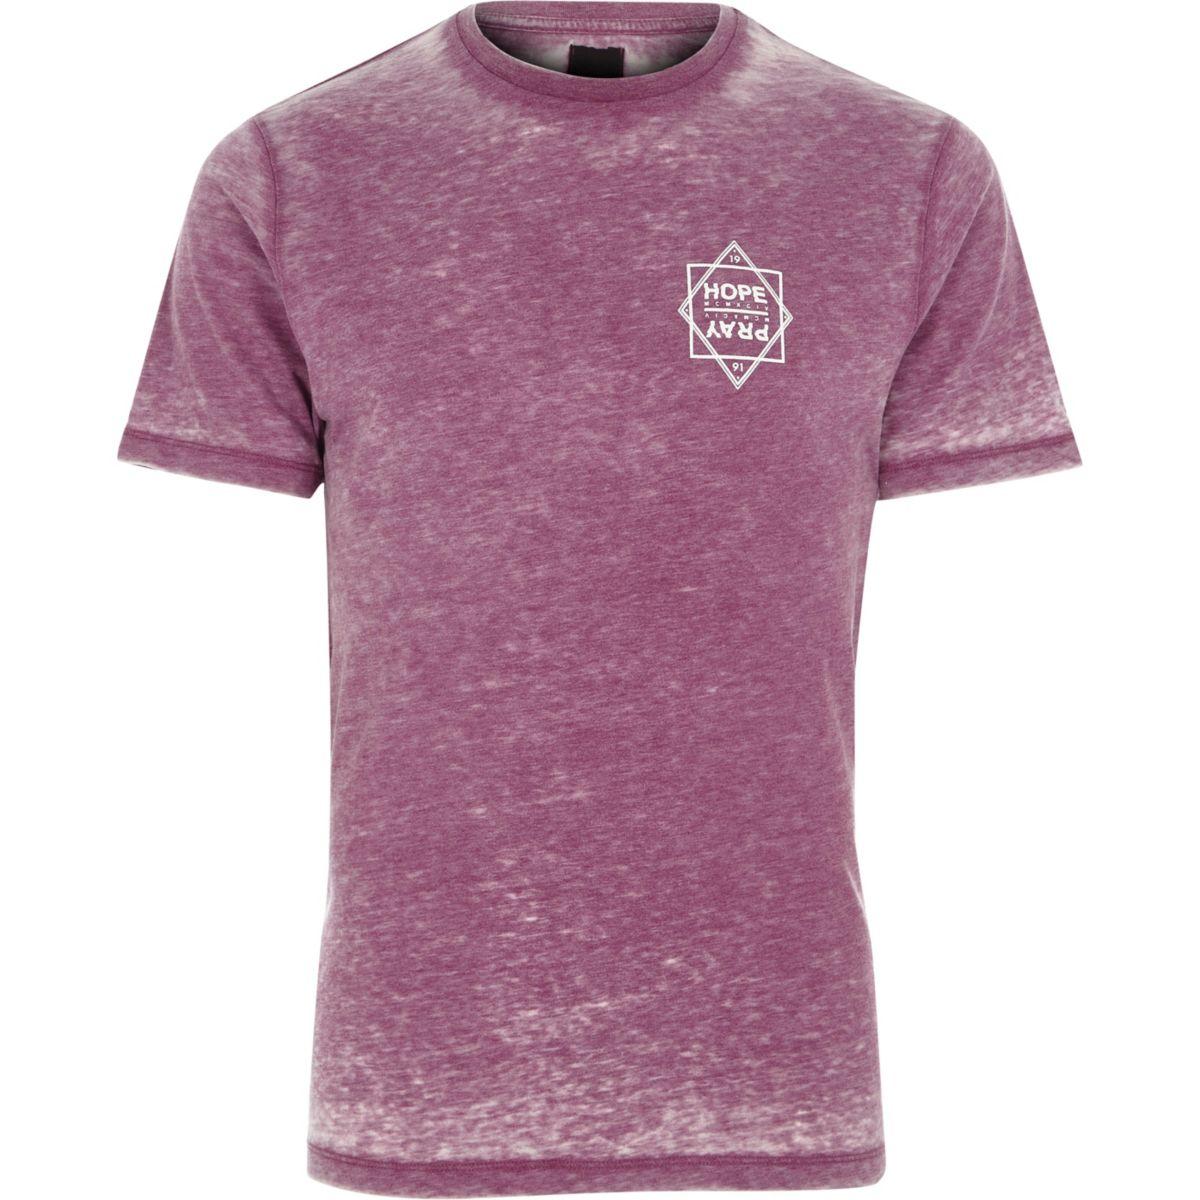 Purple burnout 'hope' print slim fit T-shirt